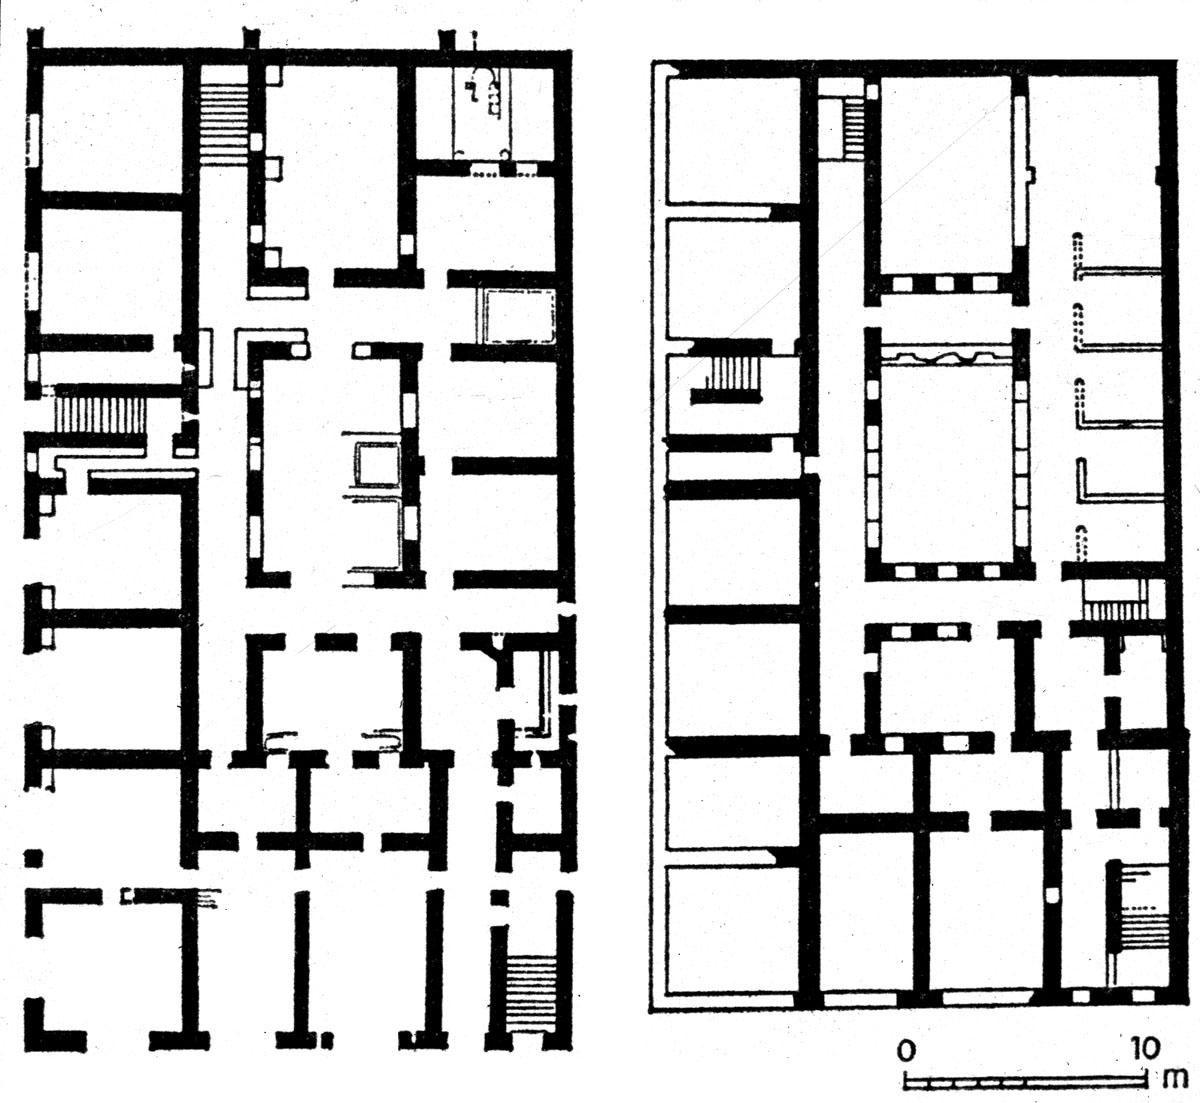 Insula Plan